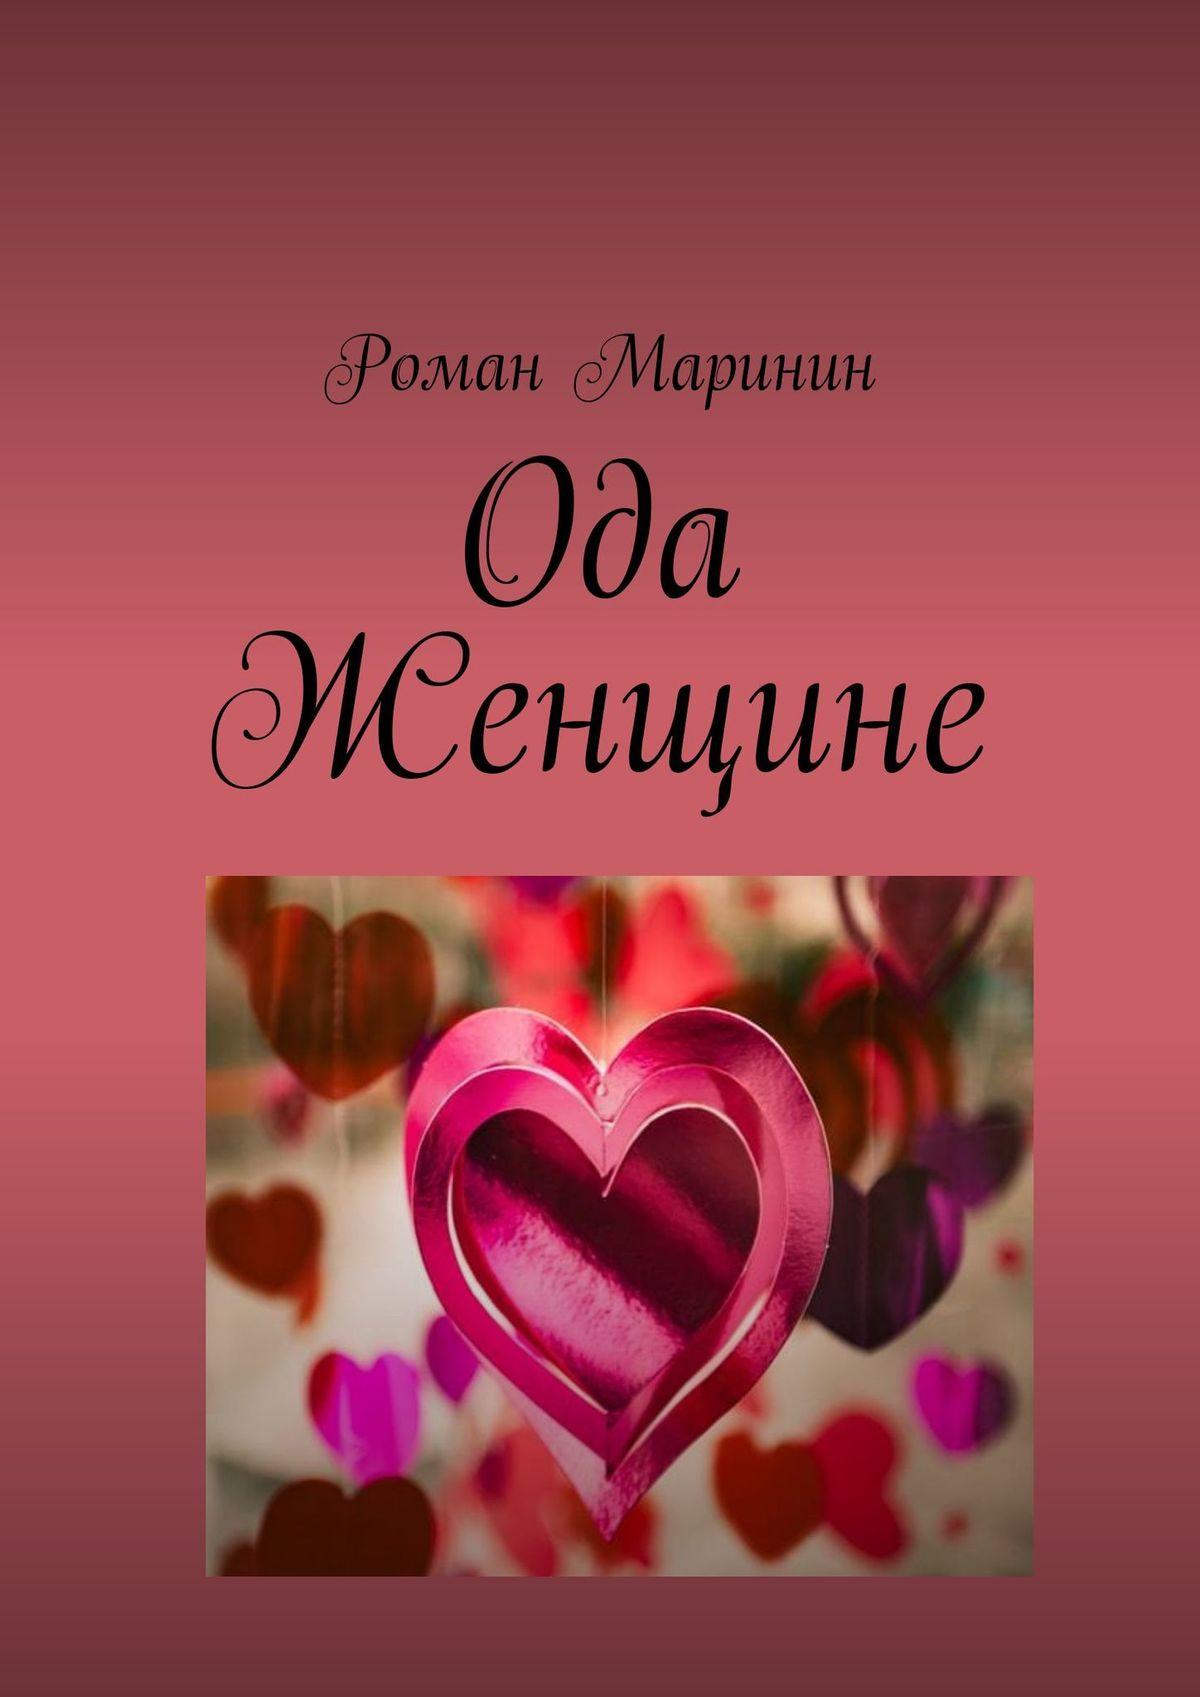 цена на Роман Маринин Ода Женщине